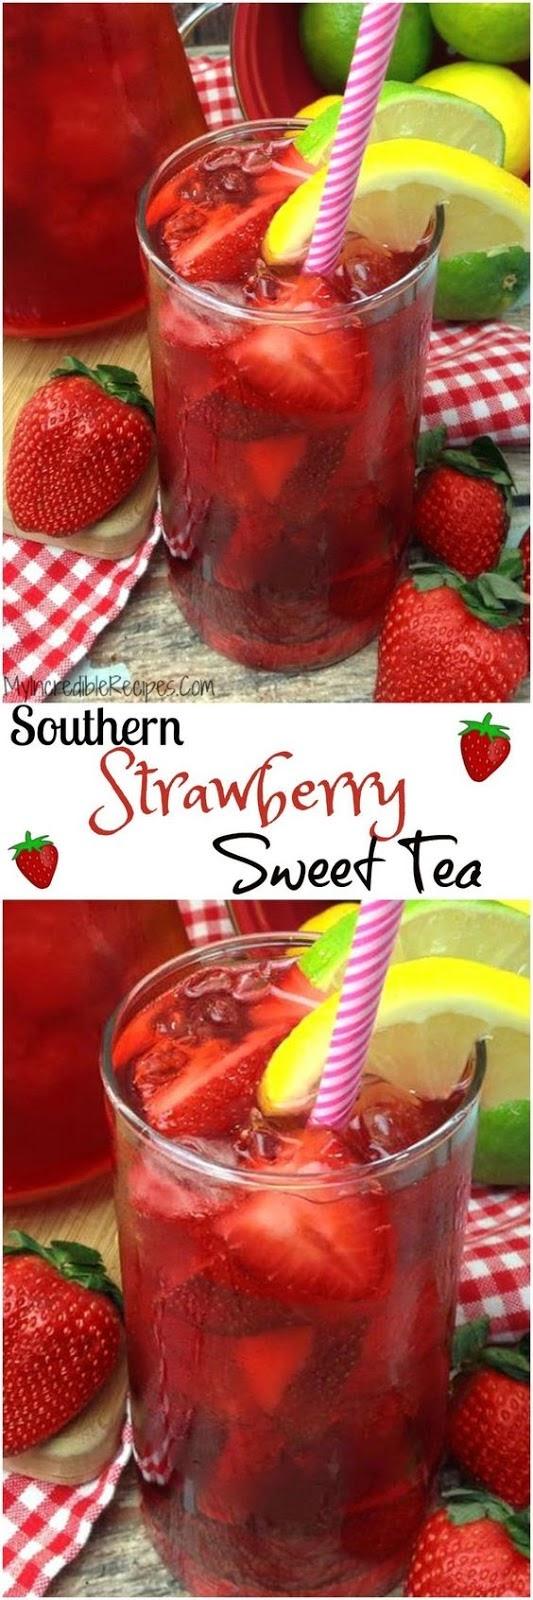 Southern Strawberry Sweet Tea Recipe